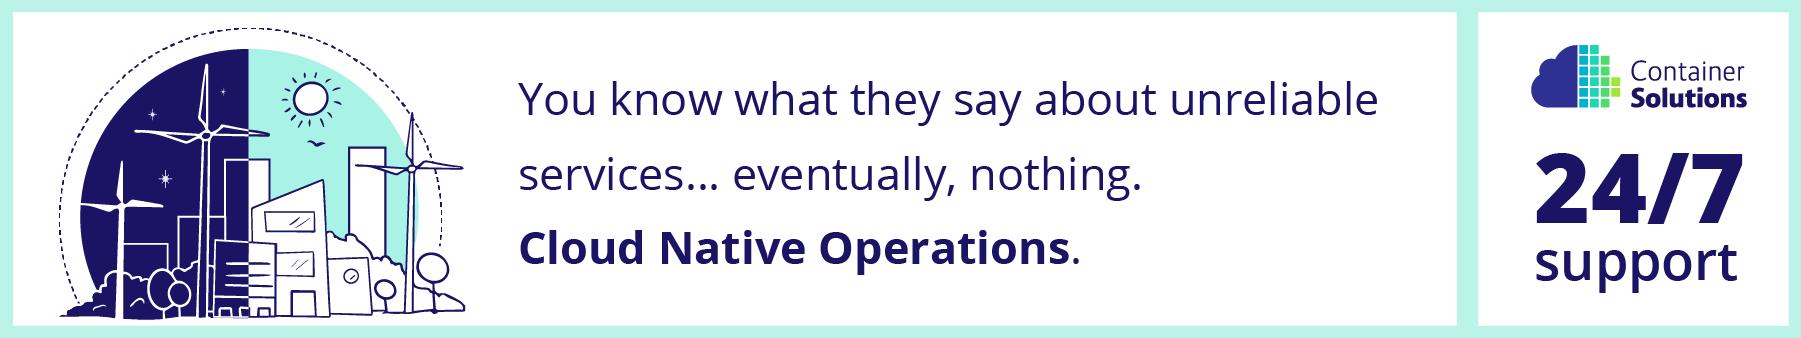 cloud_native_operations